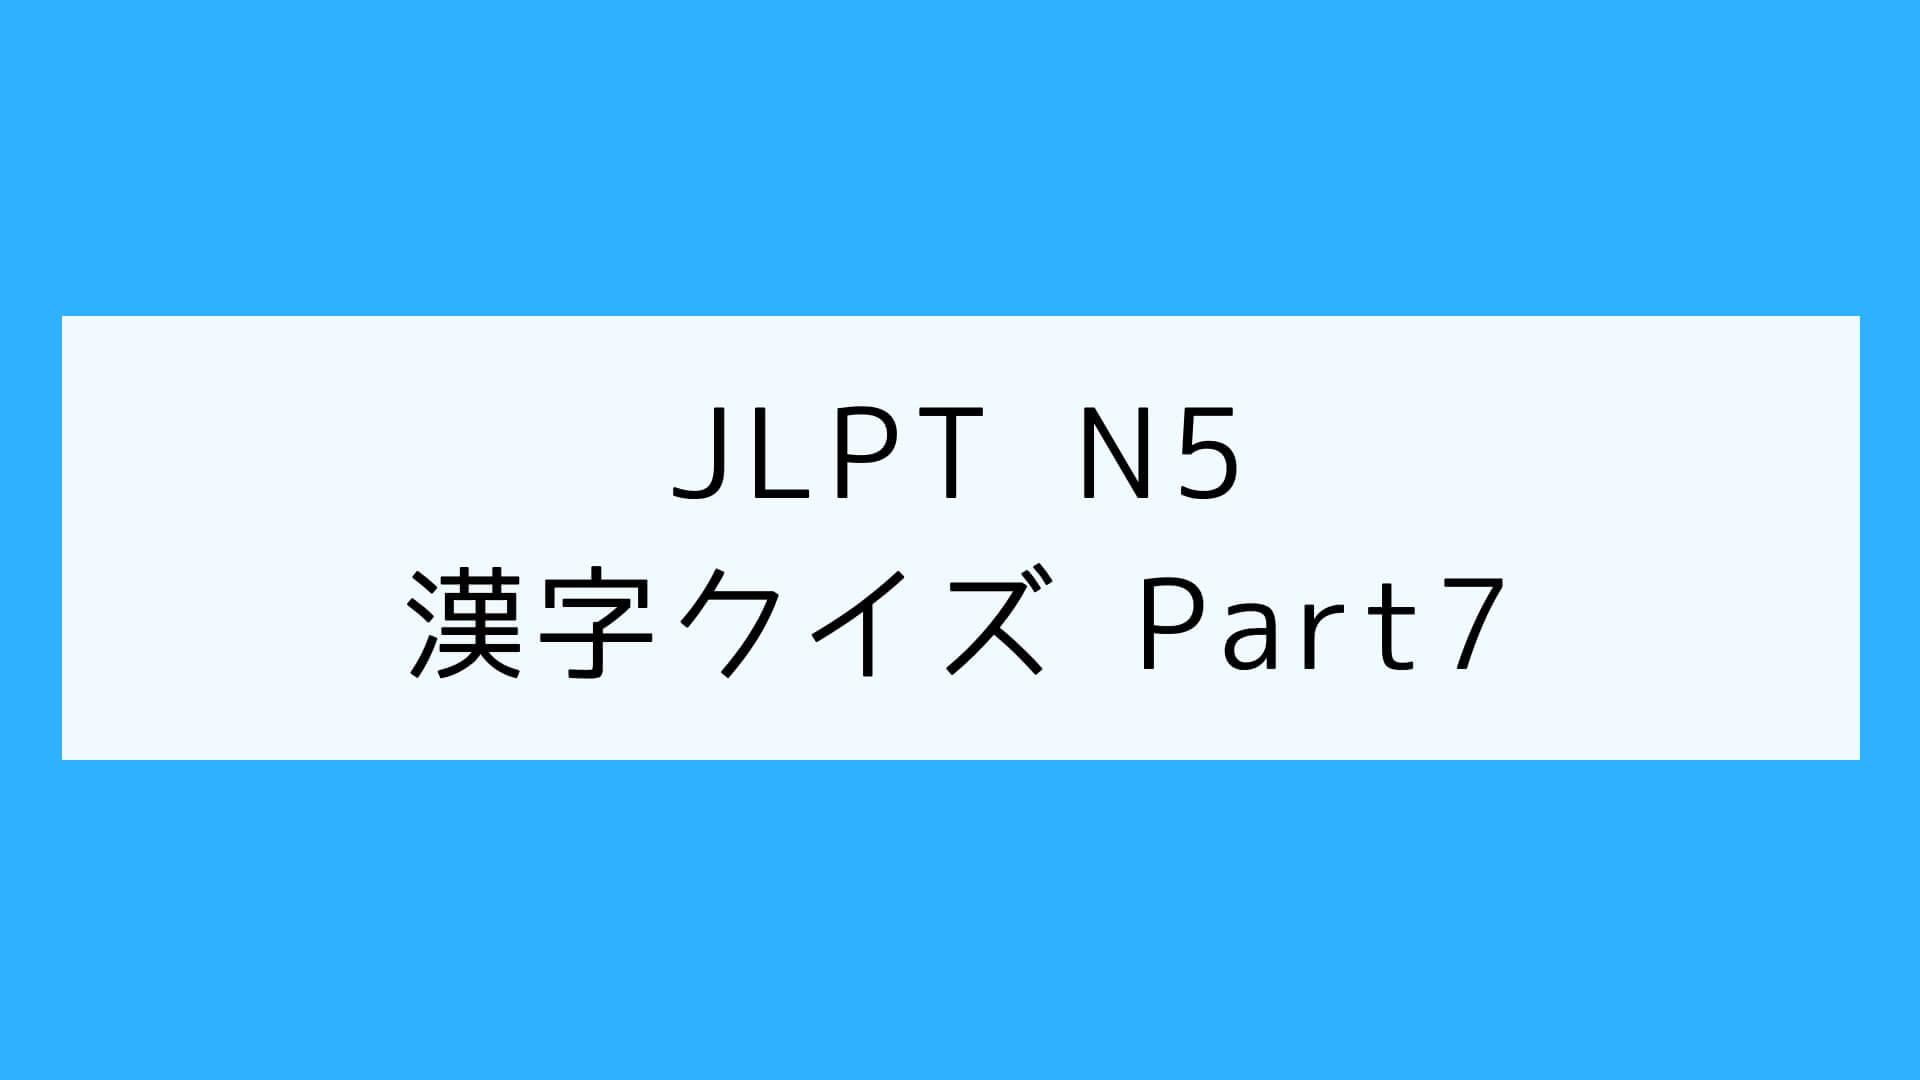 【JLPT N5】漢字クイズ Part 7